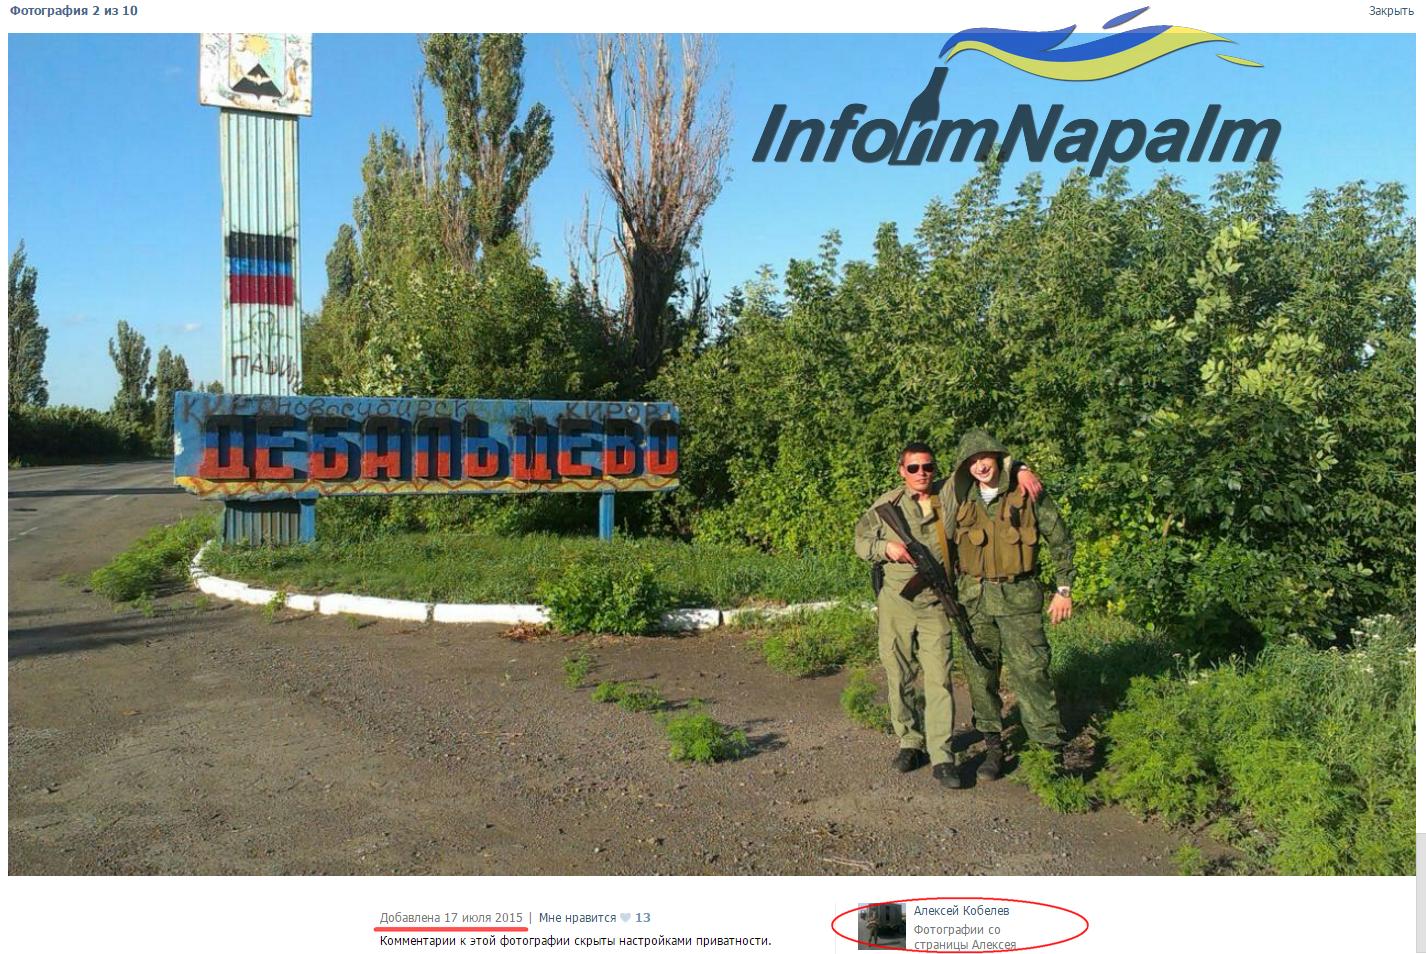 2015-09-12_170643-Кобелев-Дебальцево